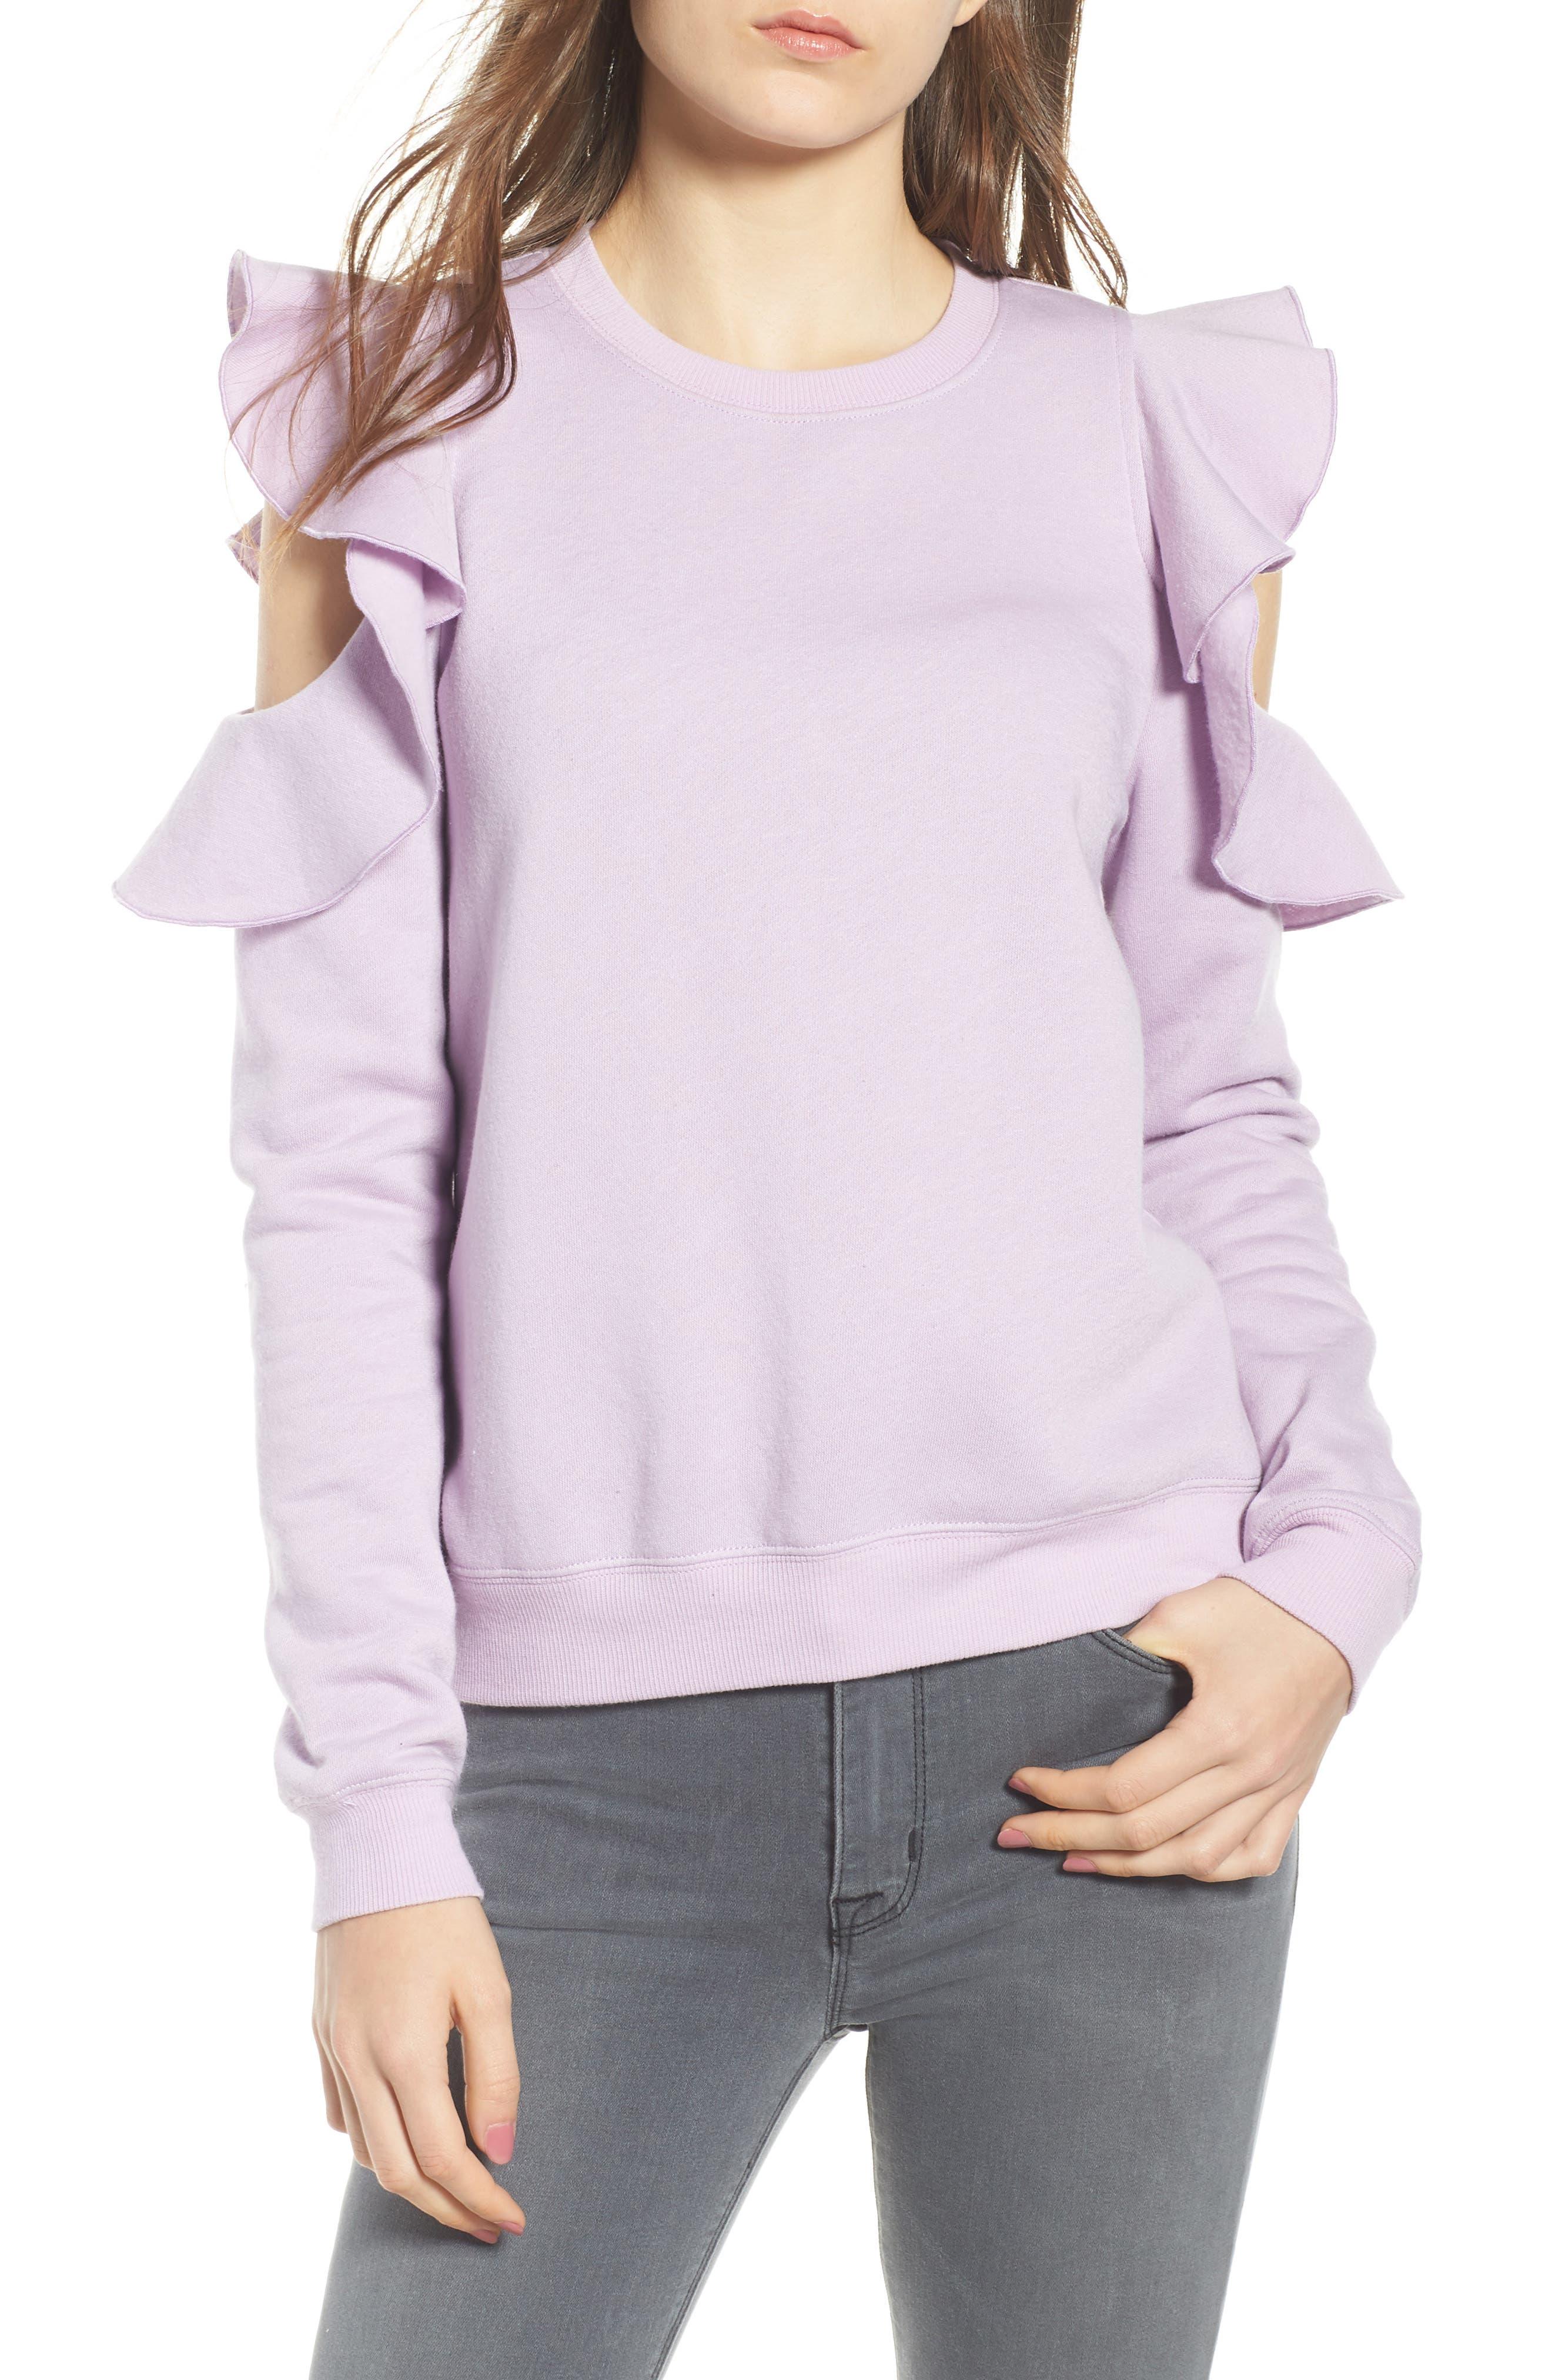 REBECCA MINKOFF, Gracie Cold Shoulder Sweatshirt, Main thumbnail 1, color, 502